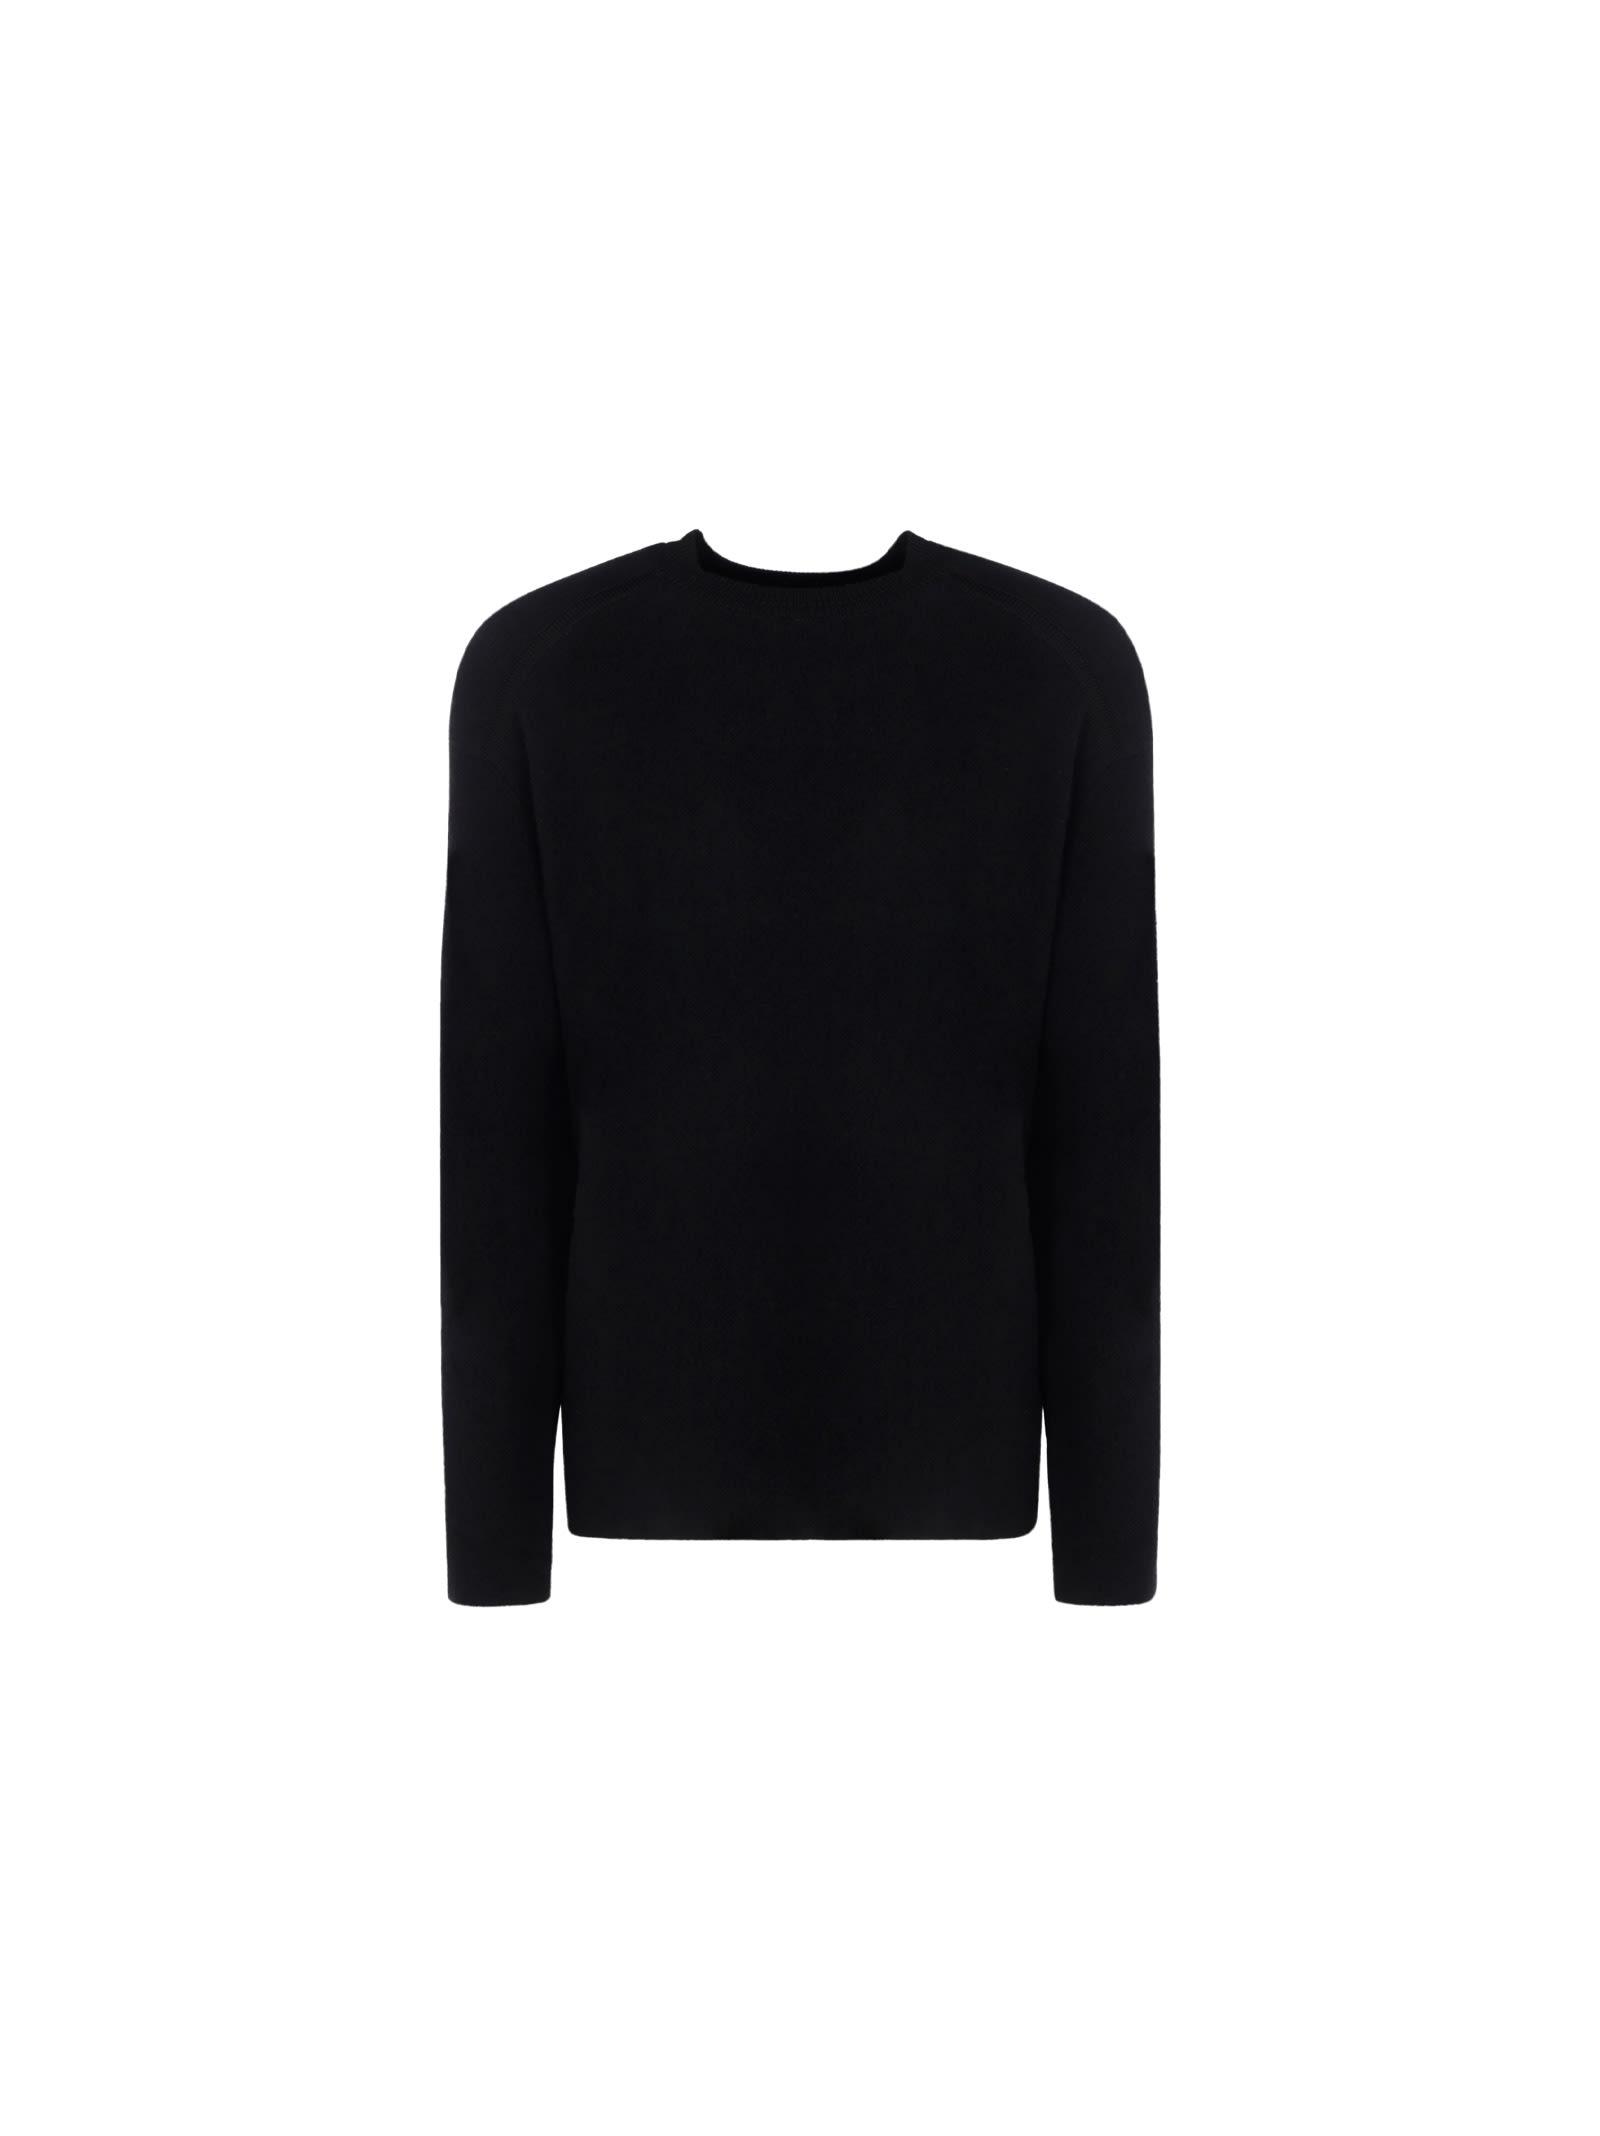 Juun J Sweater